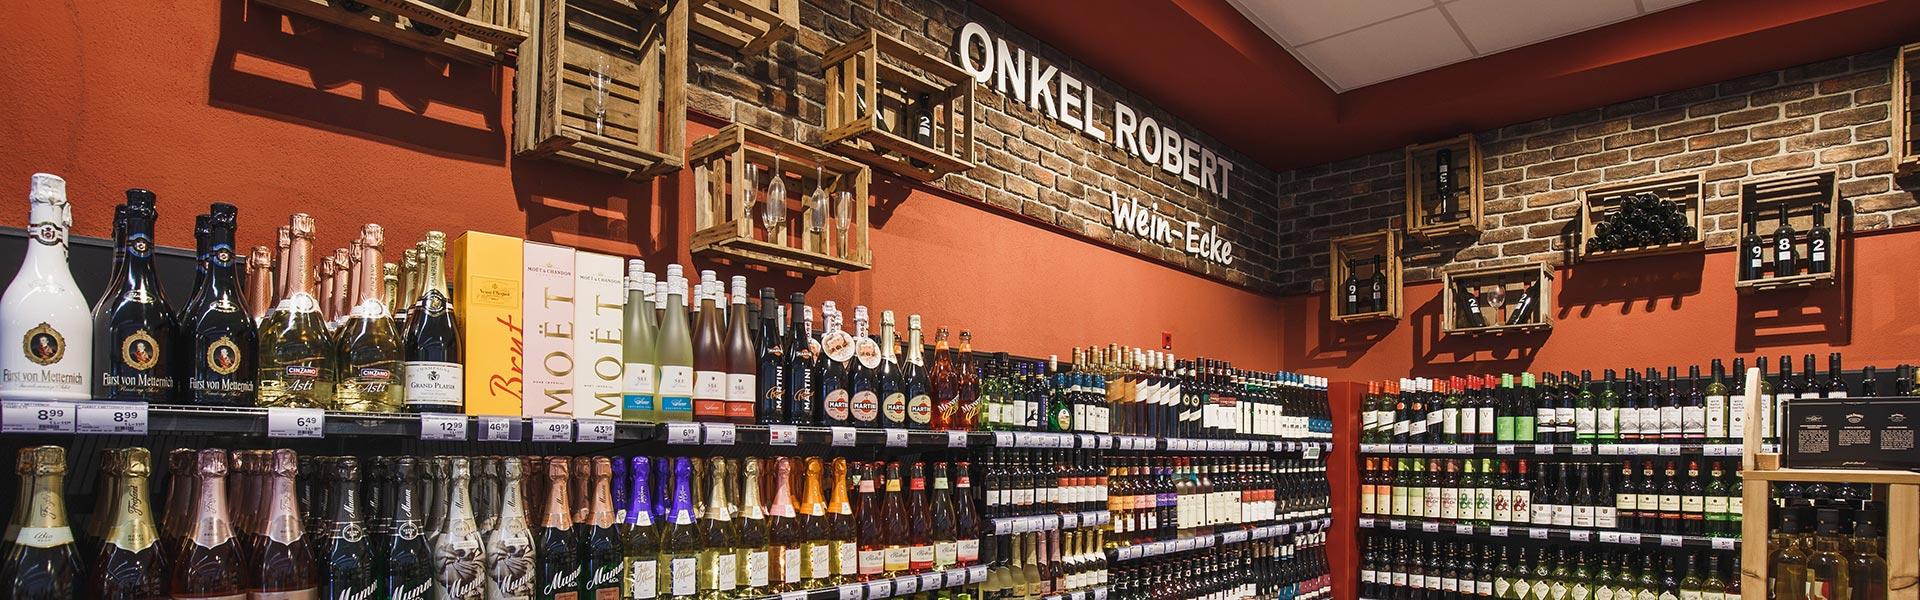 Wein-Ecke im EDEKA Lippmann in Bergatreute